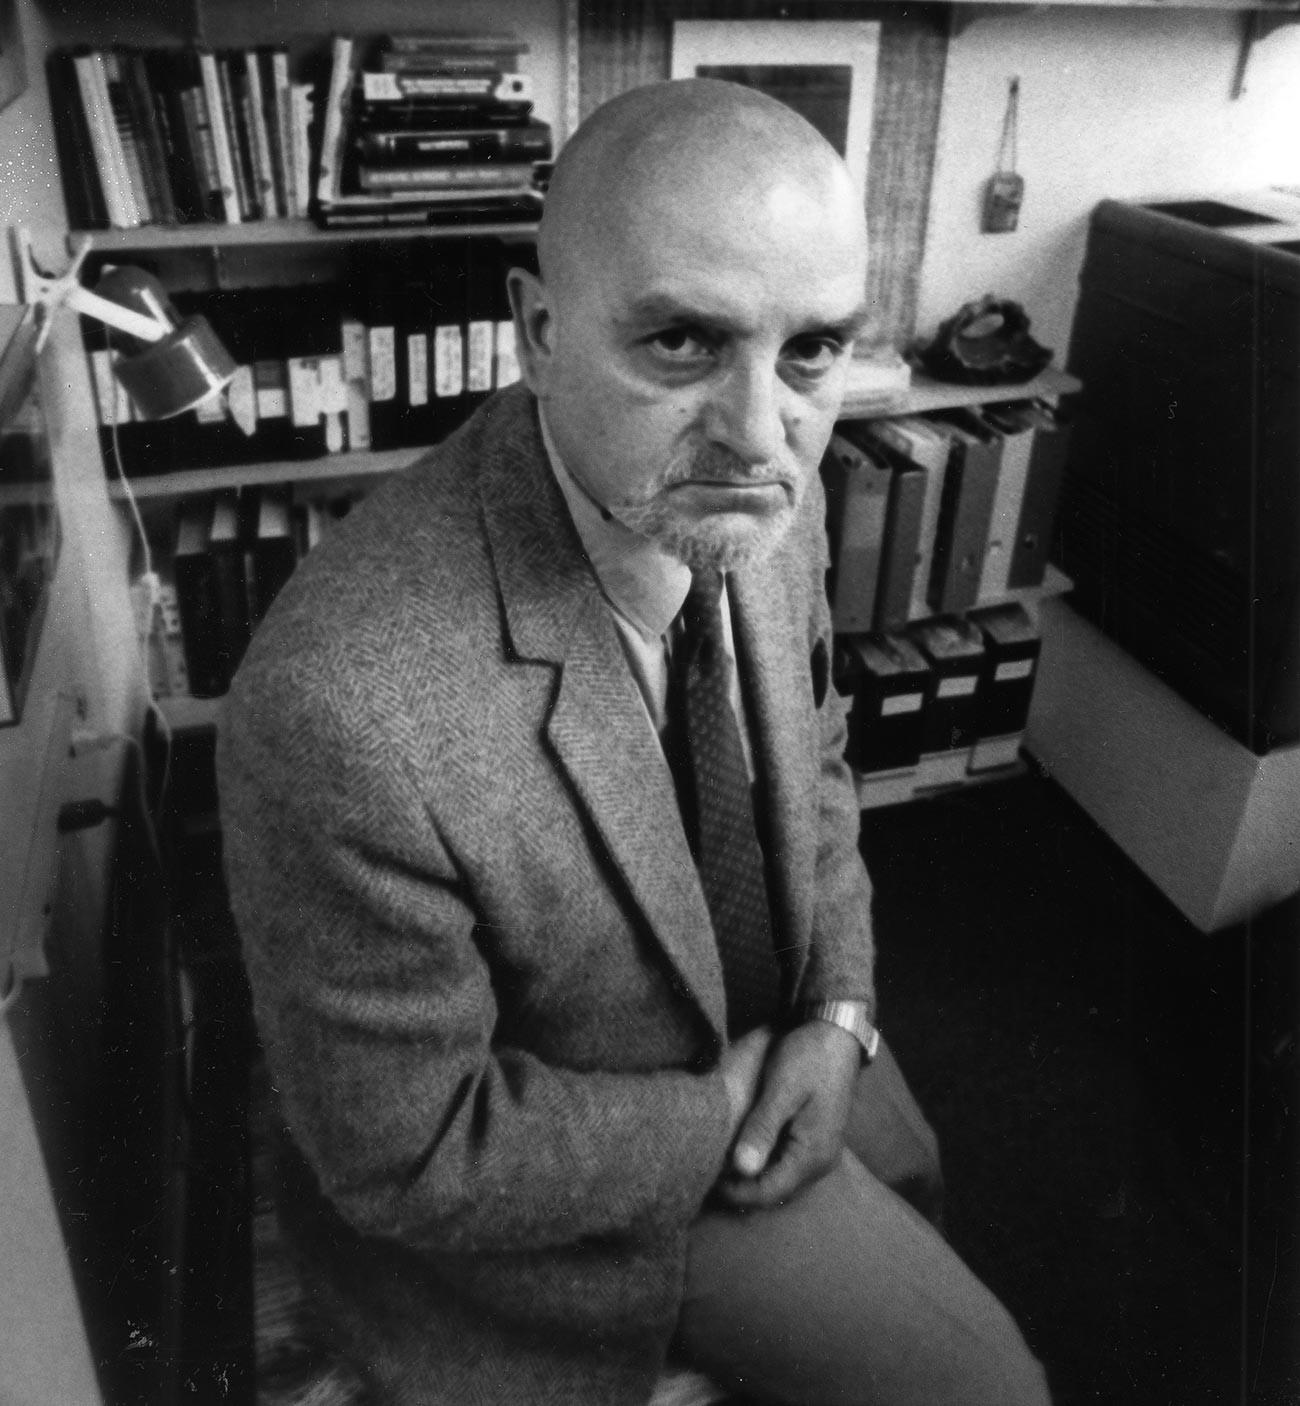 Lawrence Martin Bittman